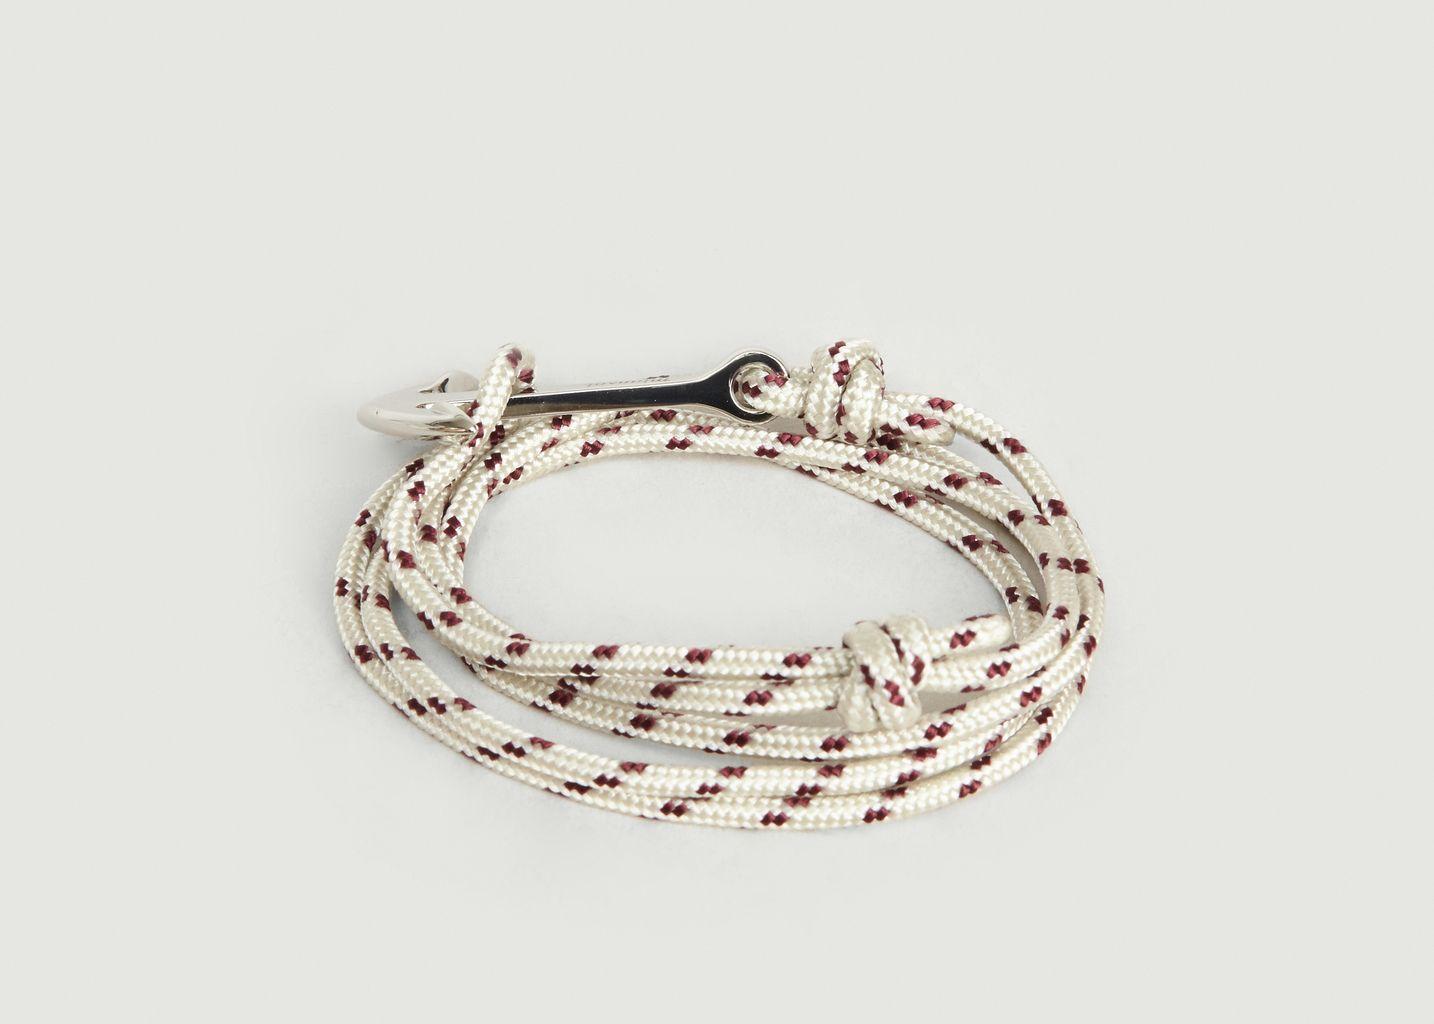 Bracelet Anchor On Rope - Miansai